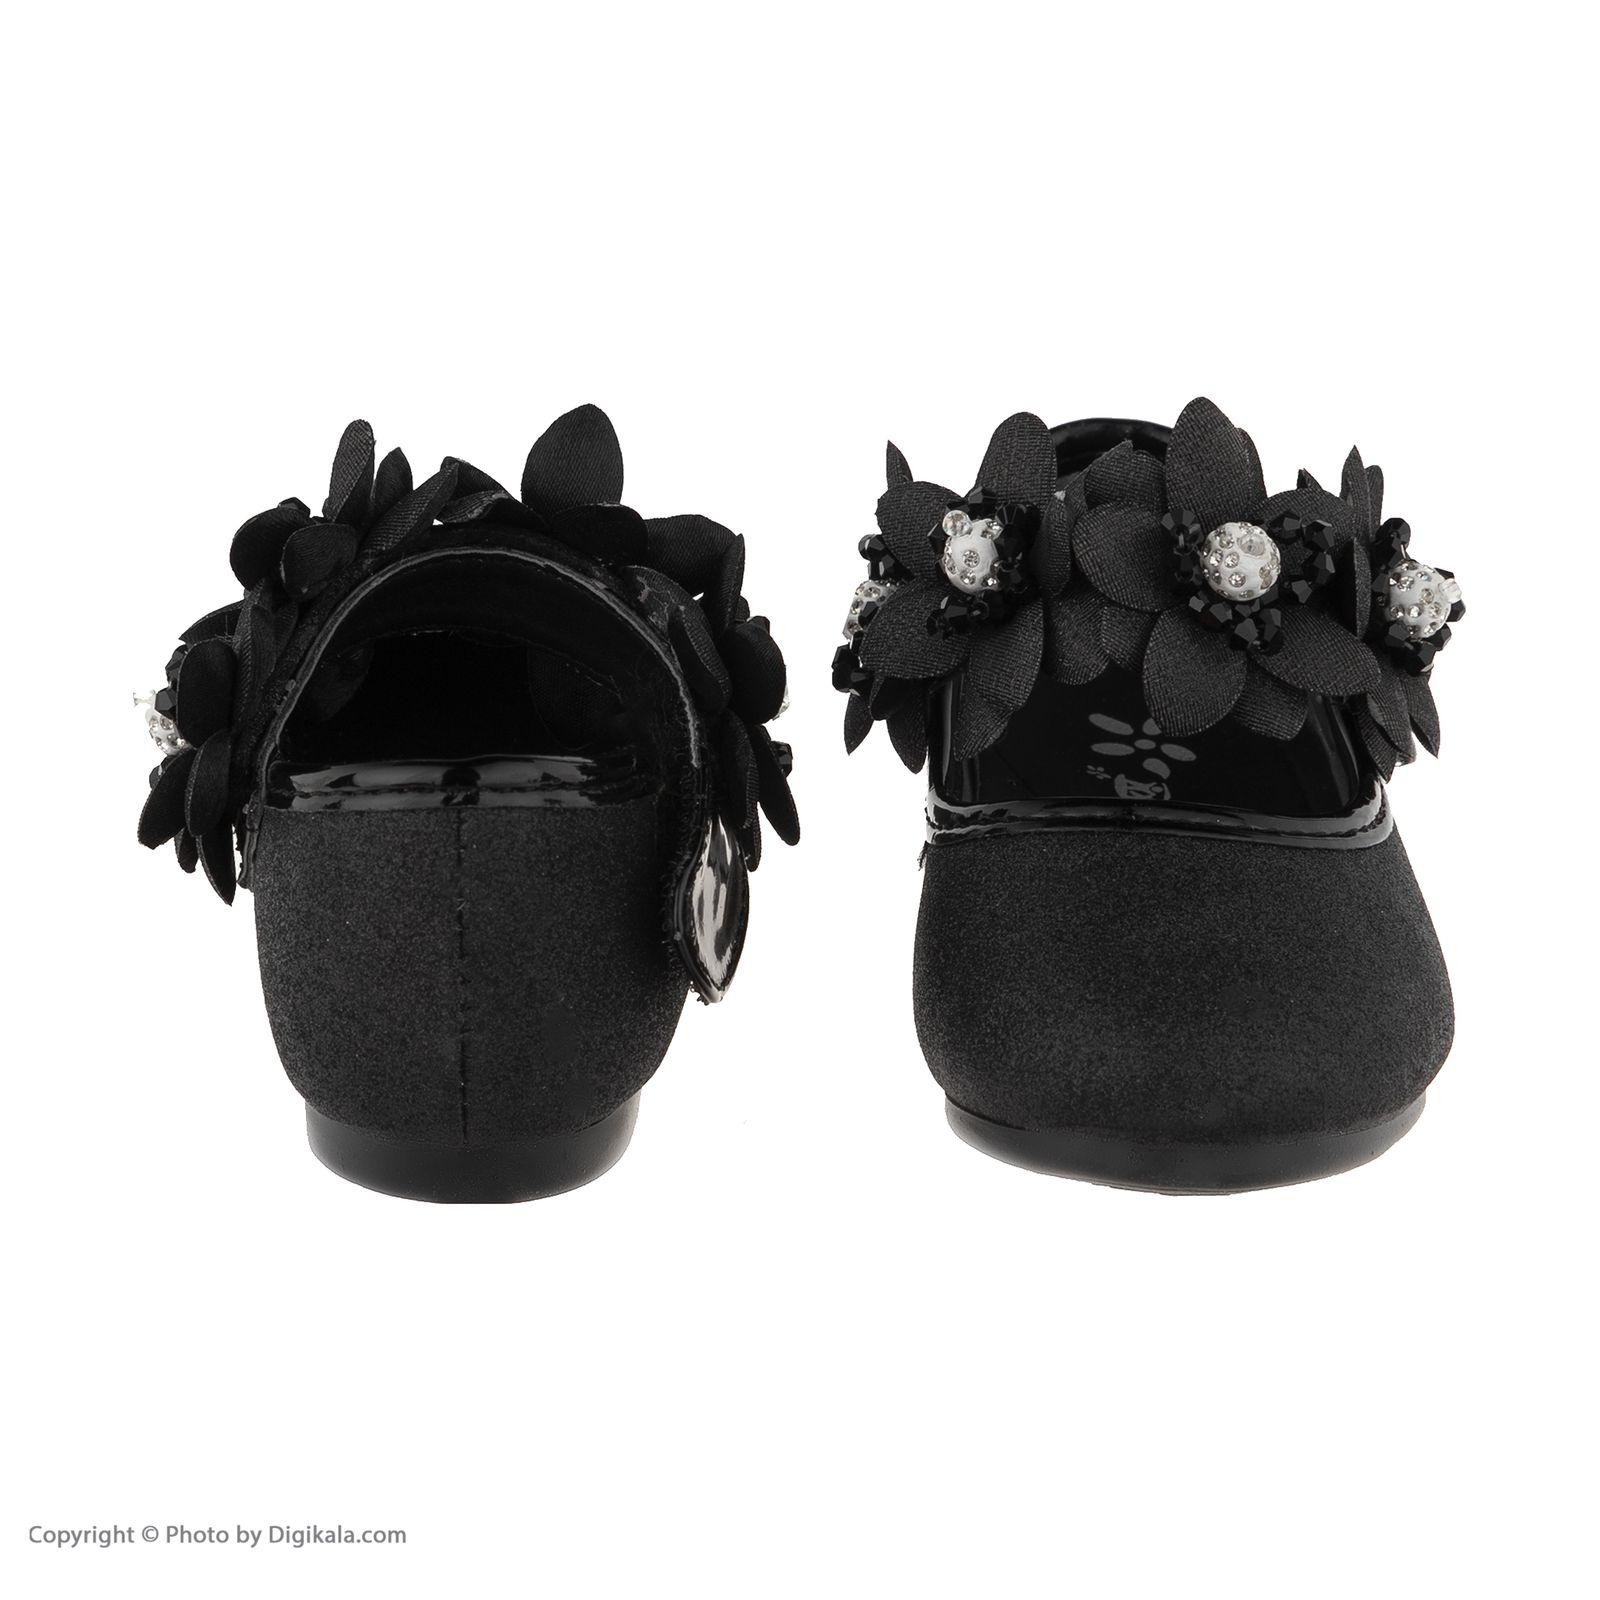 کفش دخترانه کد pa-1036 -  - 5